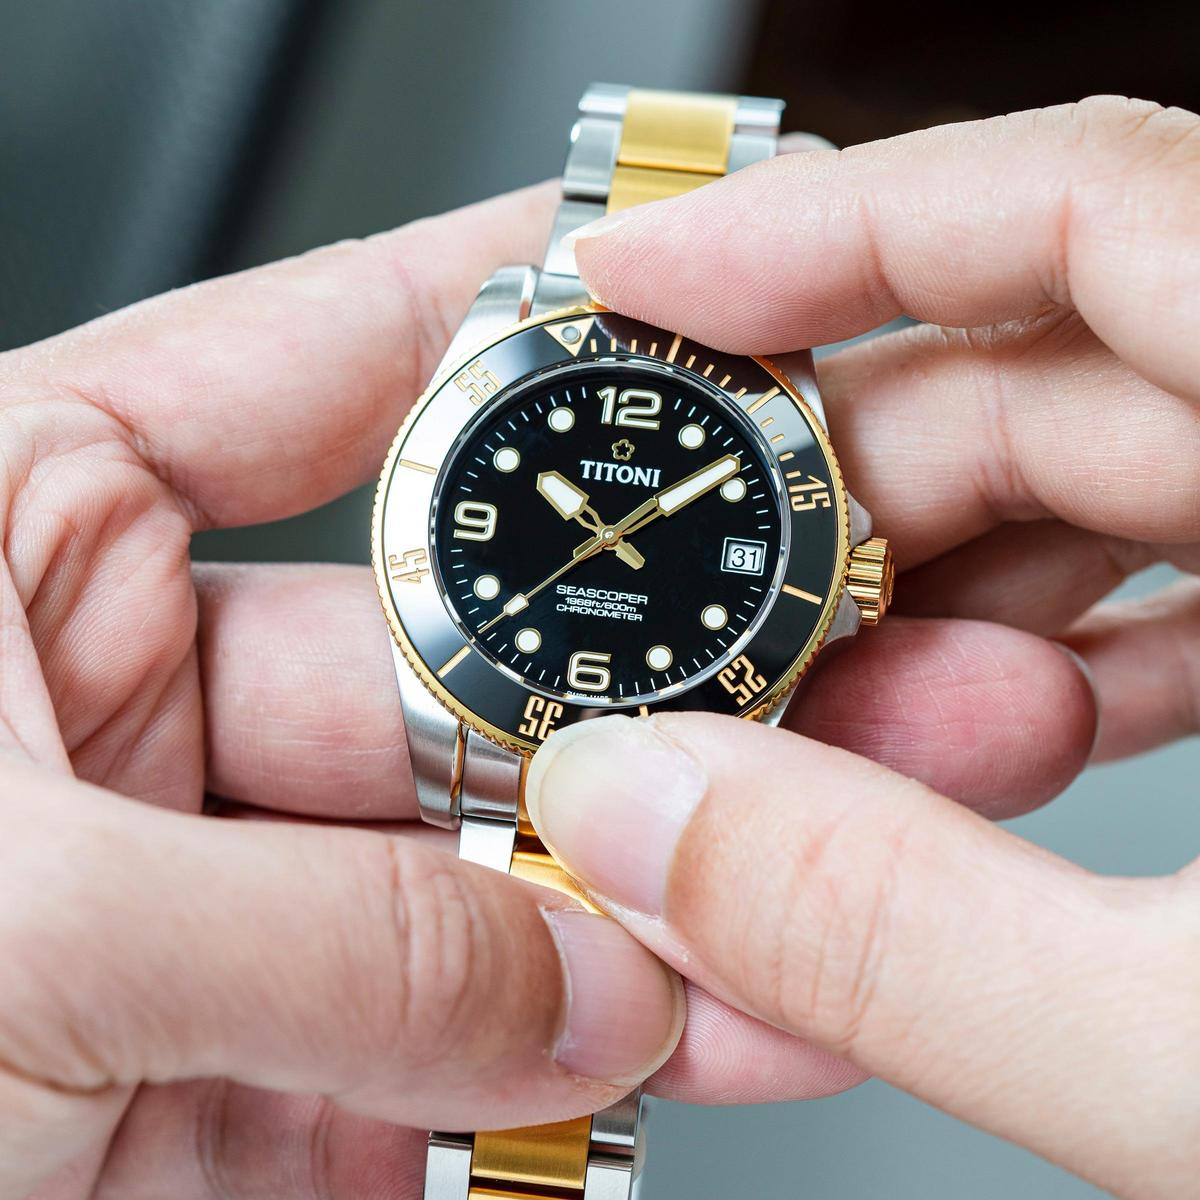 Seascoper 600系列有著典型的潛水錶元素,至於自製機芯、防水600米,這些都是目前入門潛水錶高標的水準。